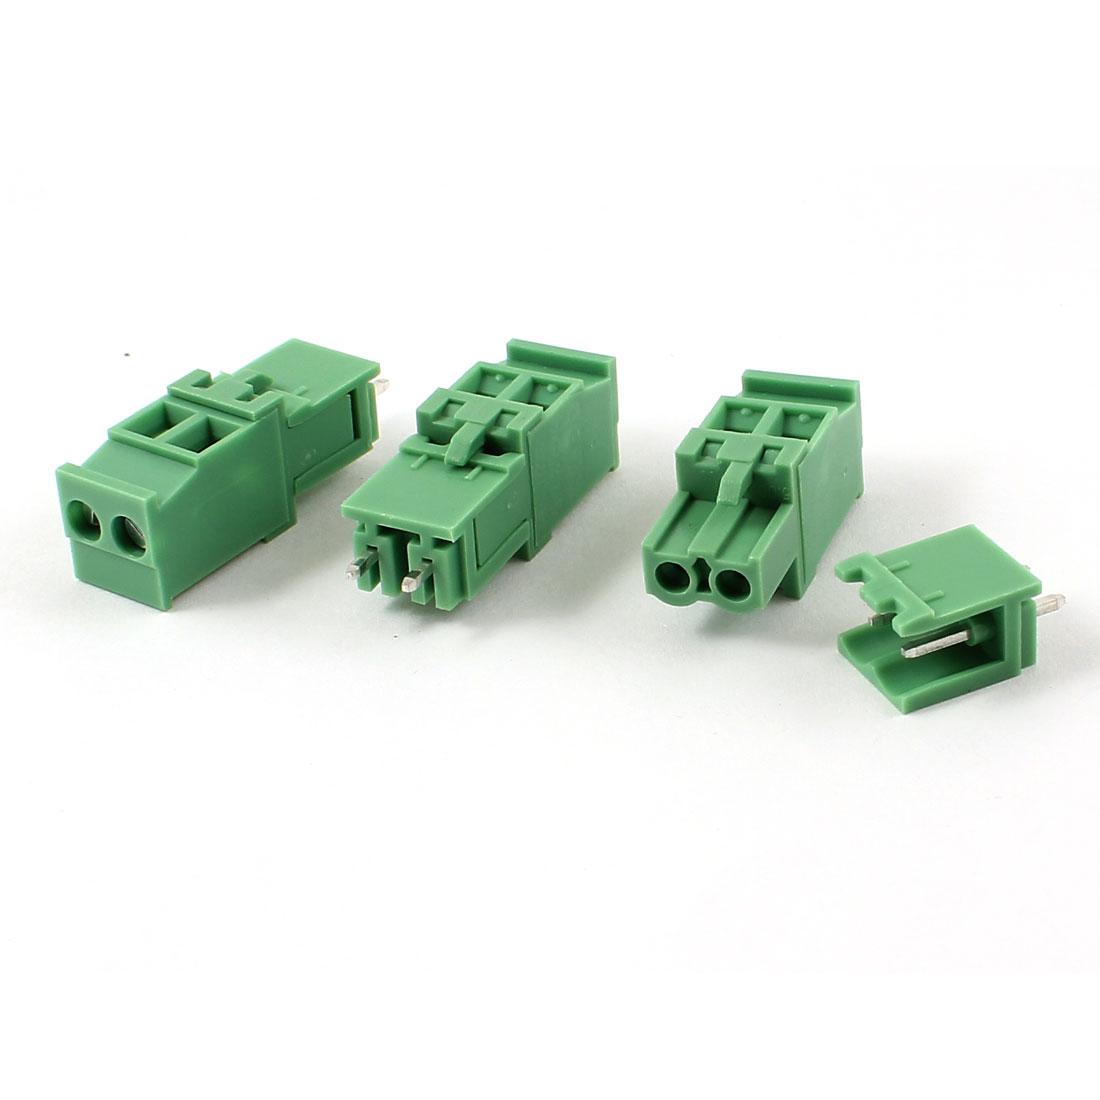 3 Pairs AC 300V 10A 5.08mm Spacing 2 Pin Screw Pluggable Terminal Block